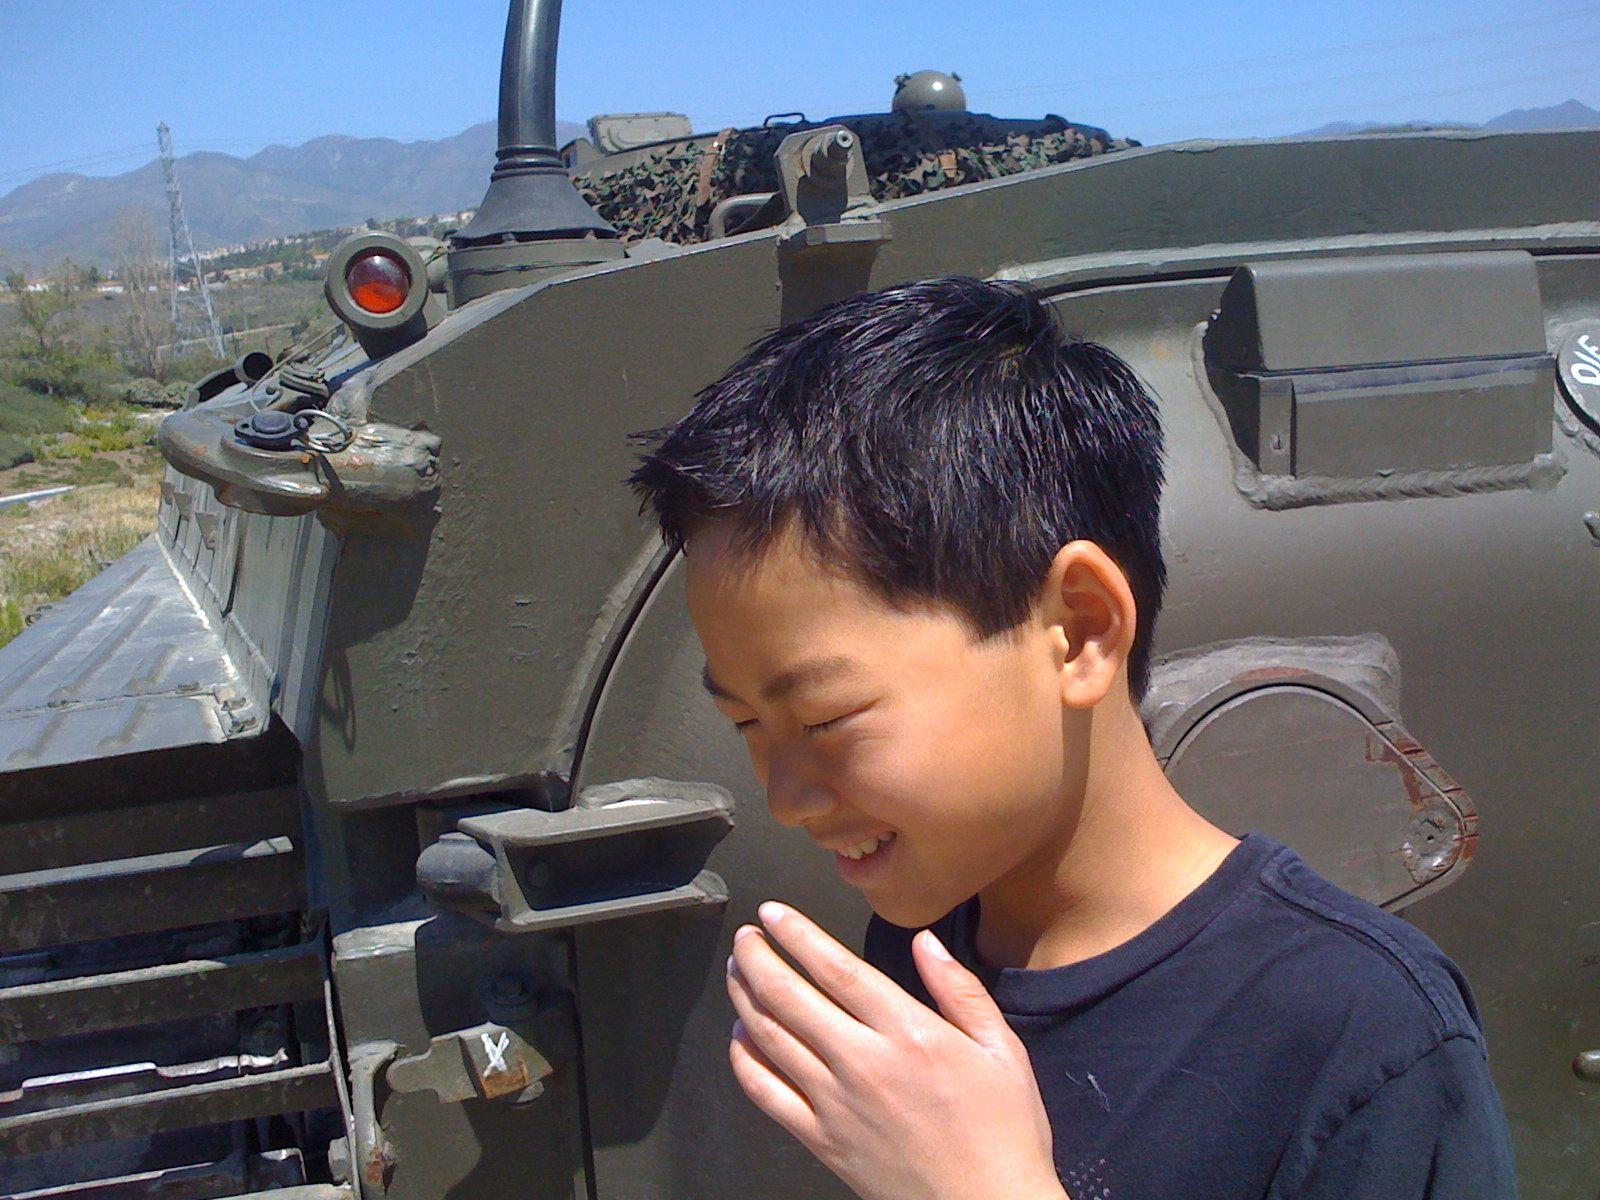 Boy meets Tank